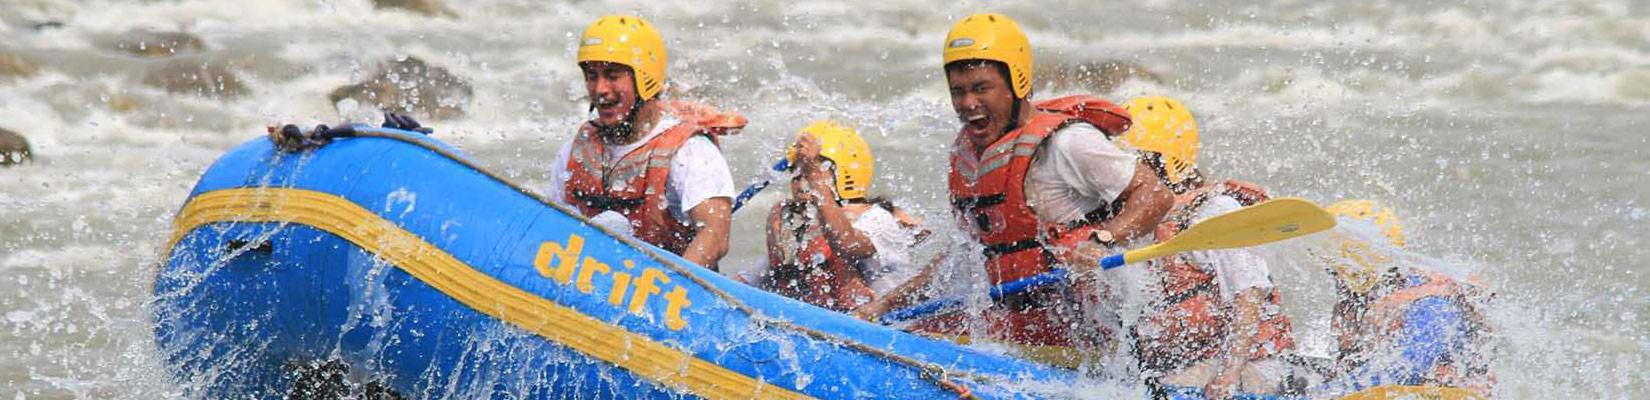 White River Rafting - Trishuli River